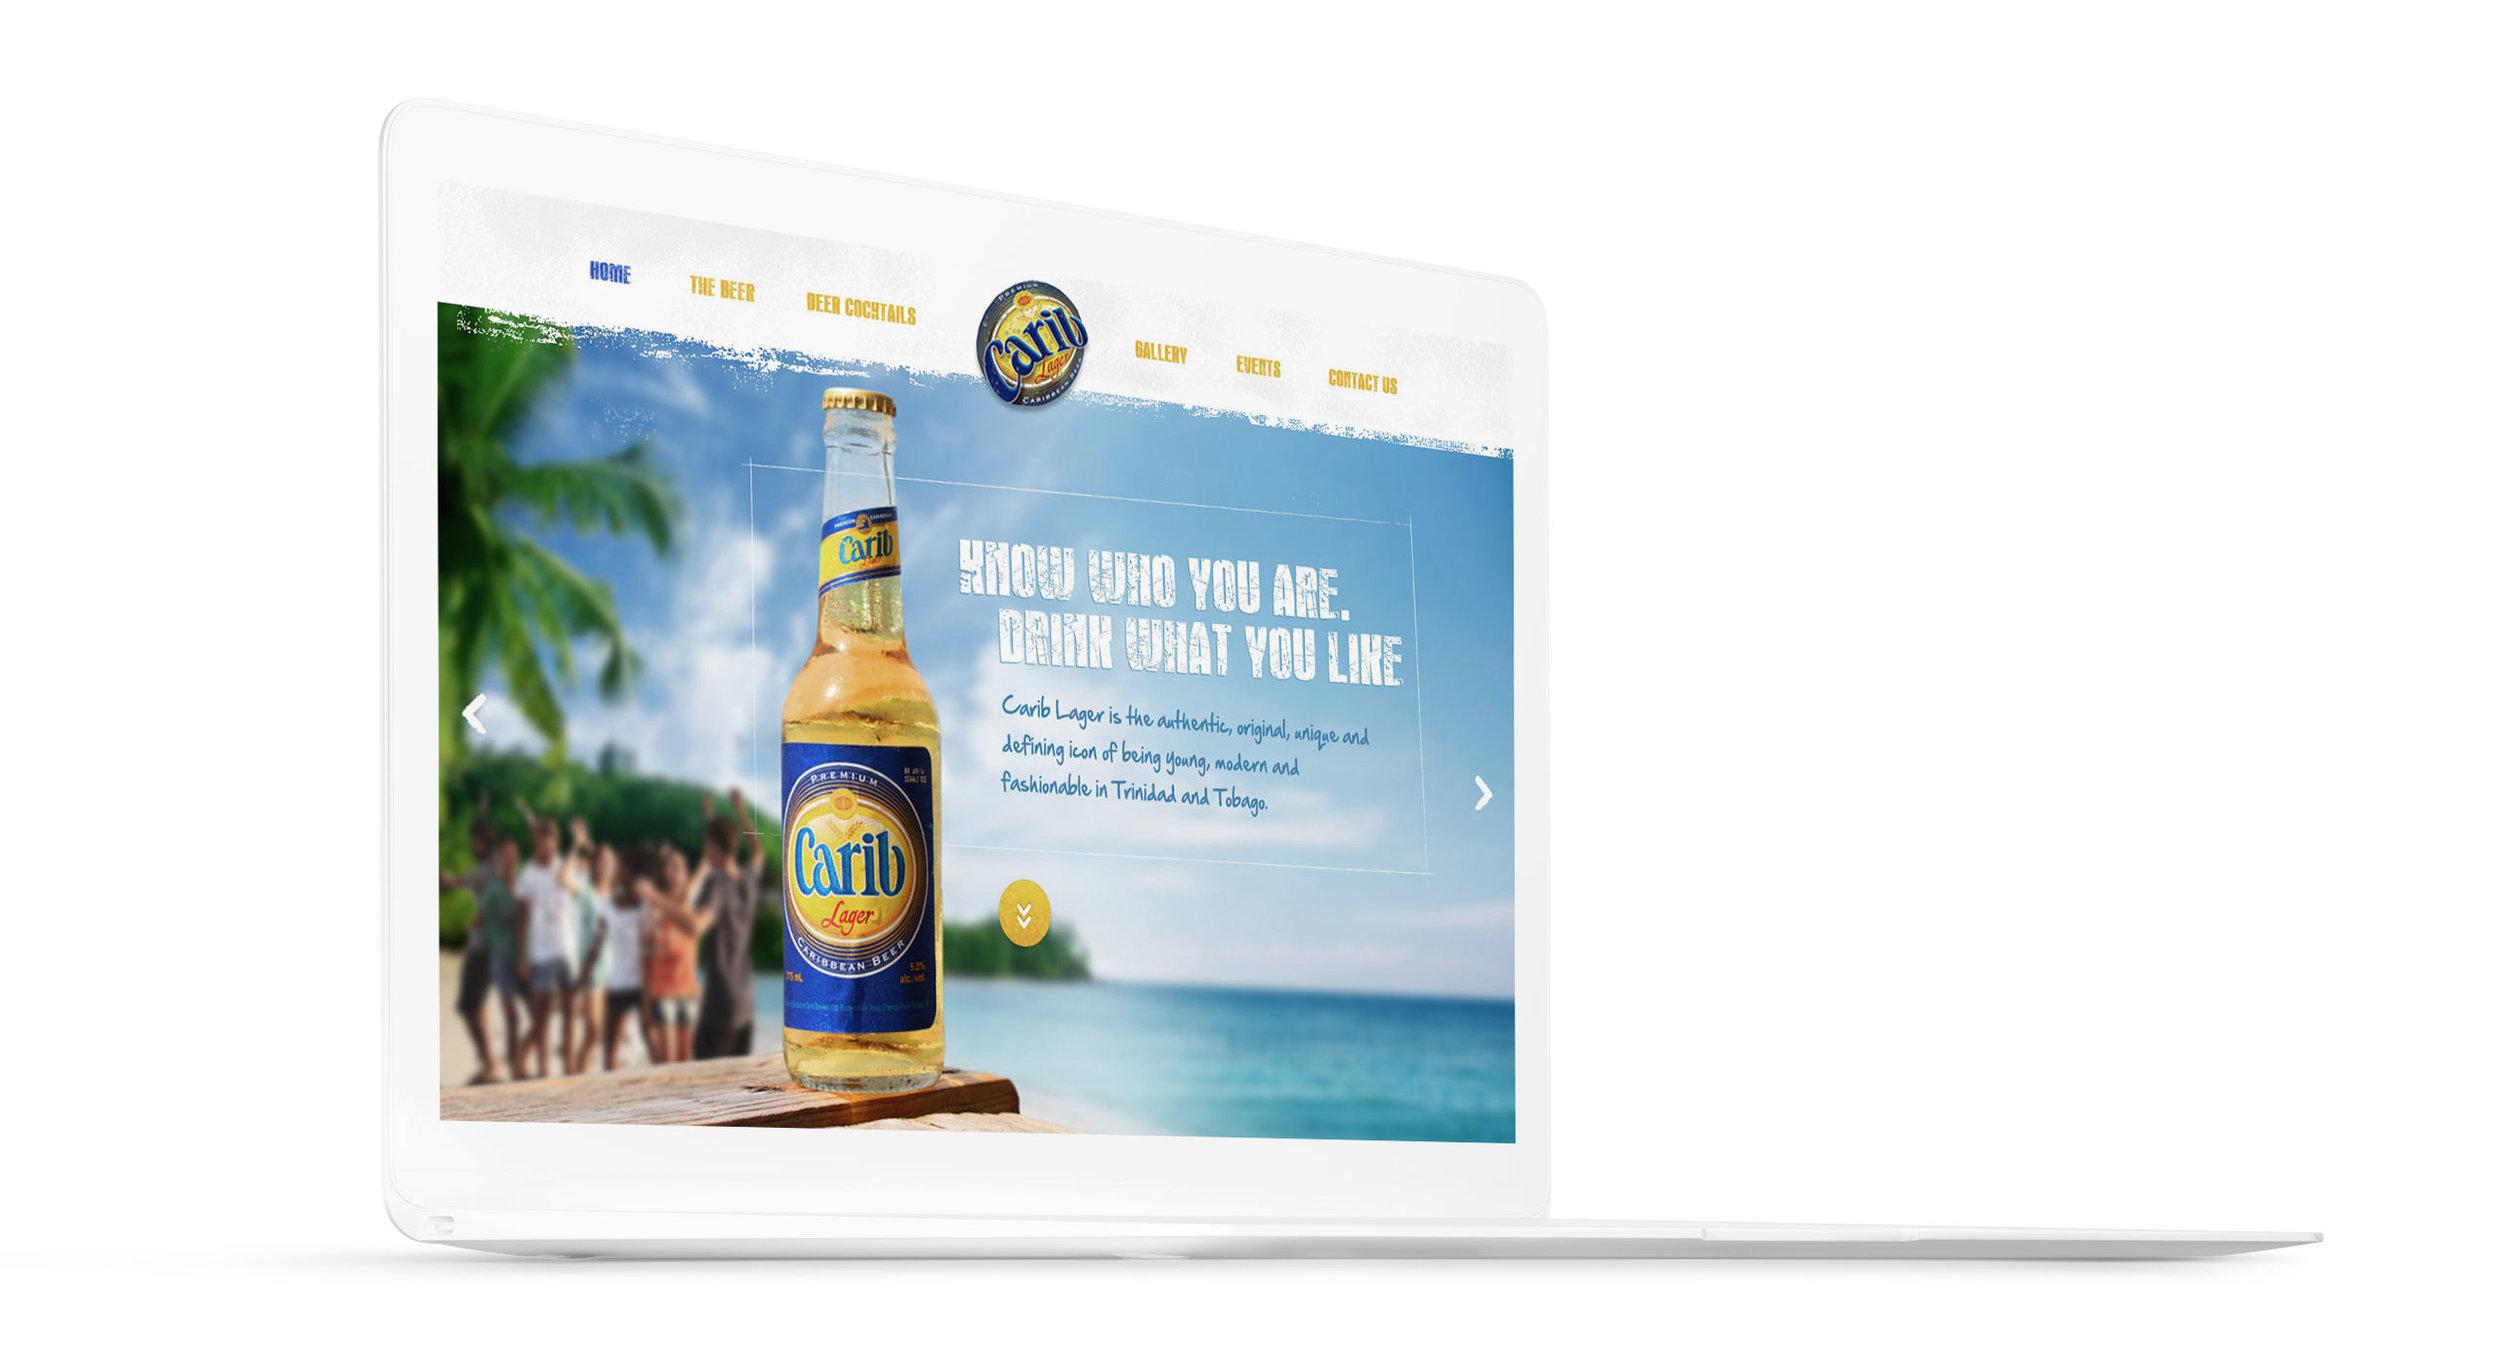 carib_lifestyle.jpg